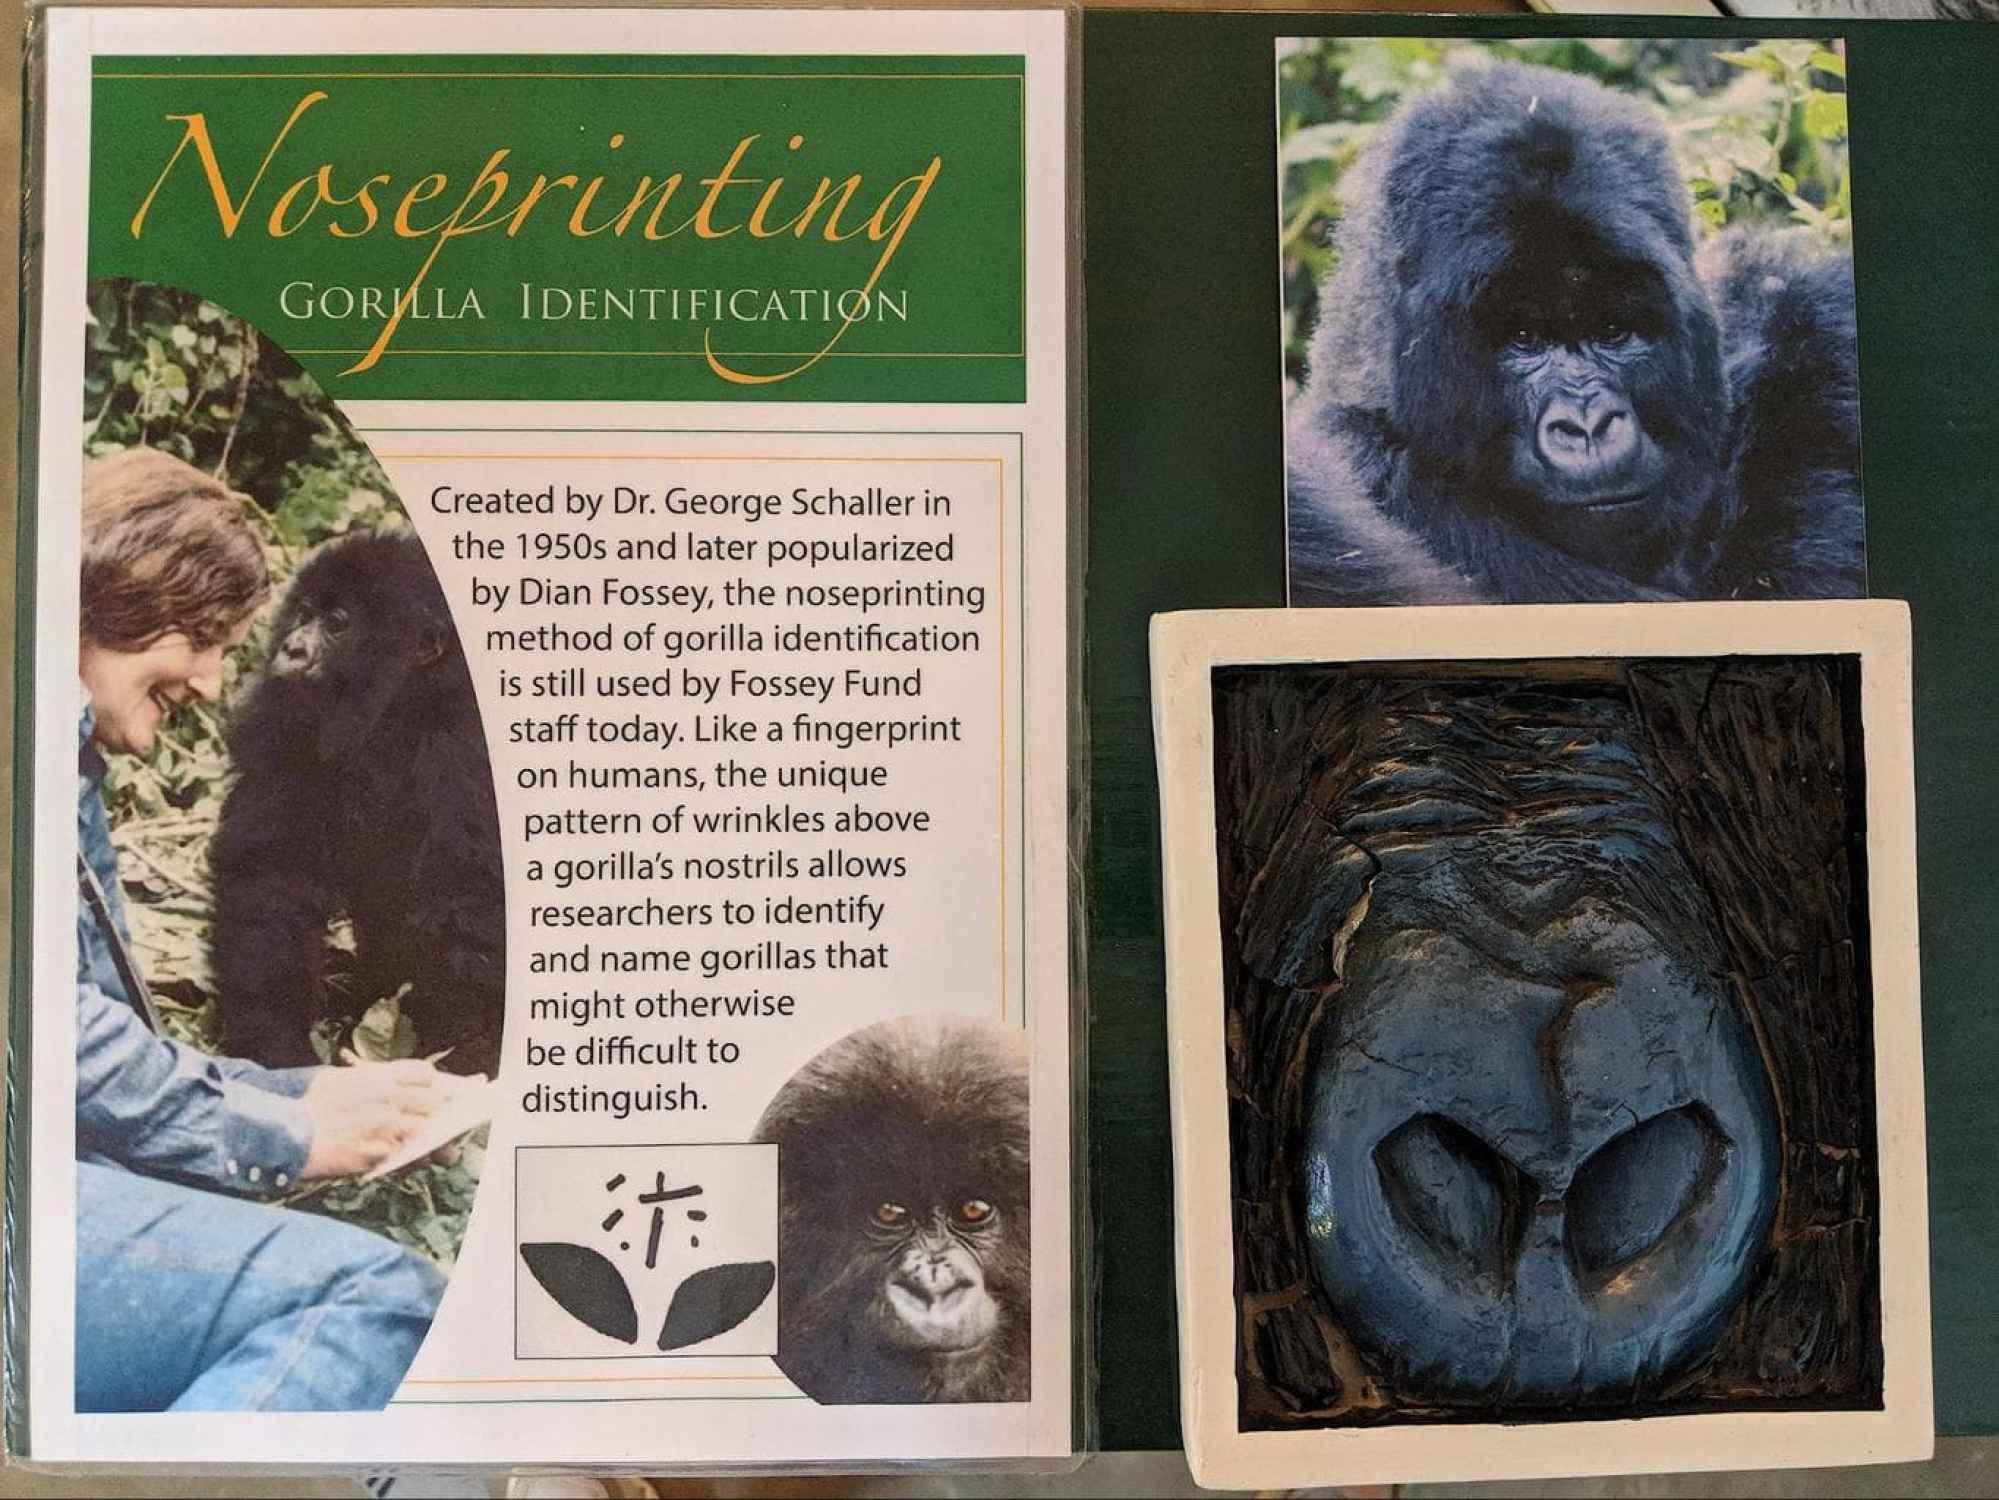 Noseprint explanation from the Gorilla Fund museum in Rwanda